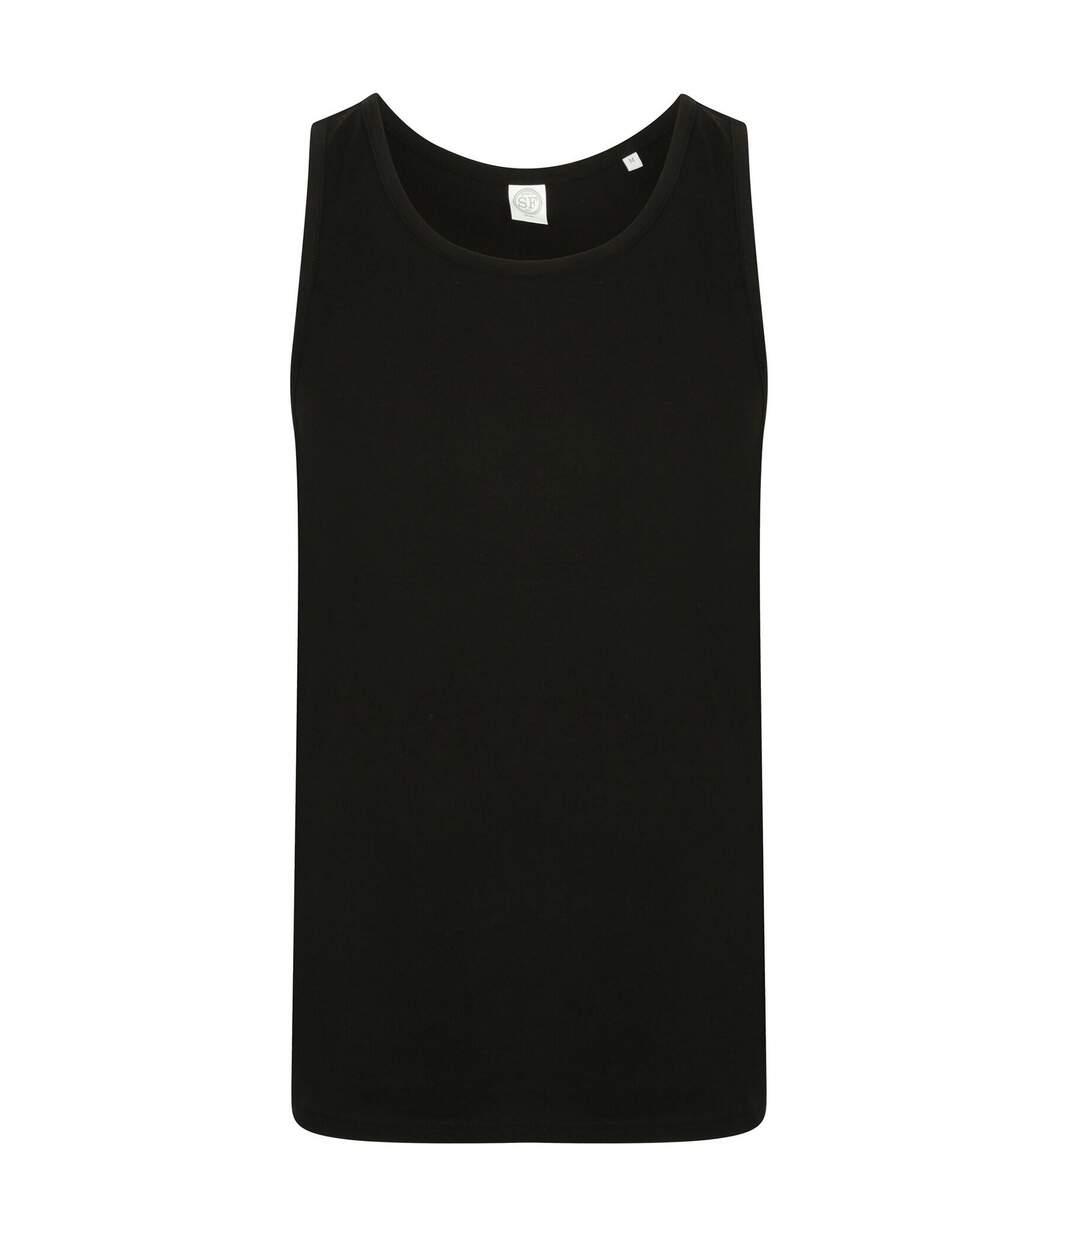 SF Mens Feel Good Stretch Vest (Black) - UTPC3020